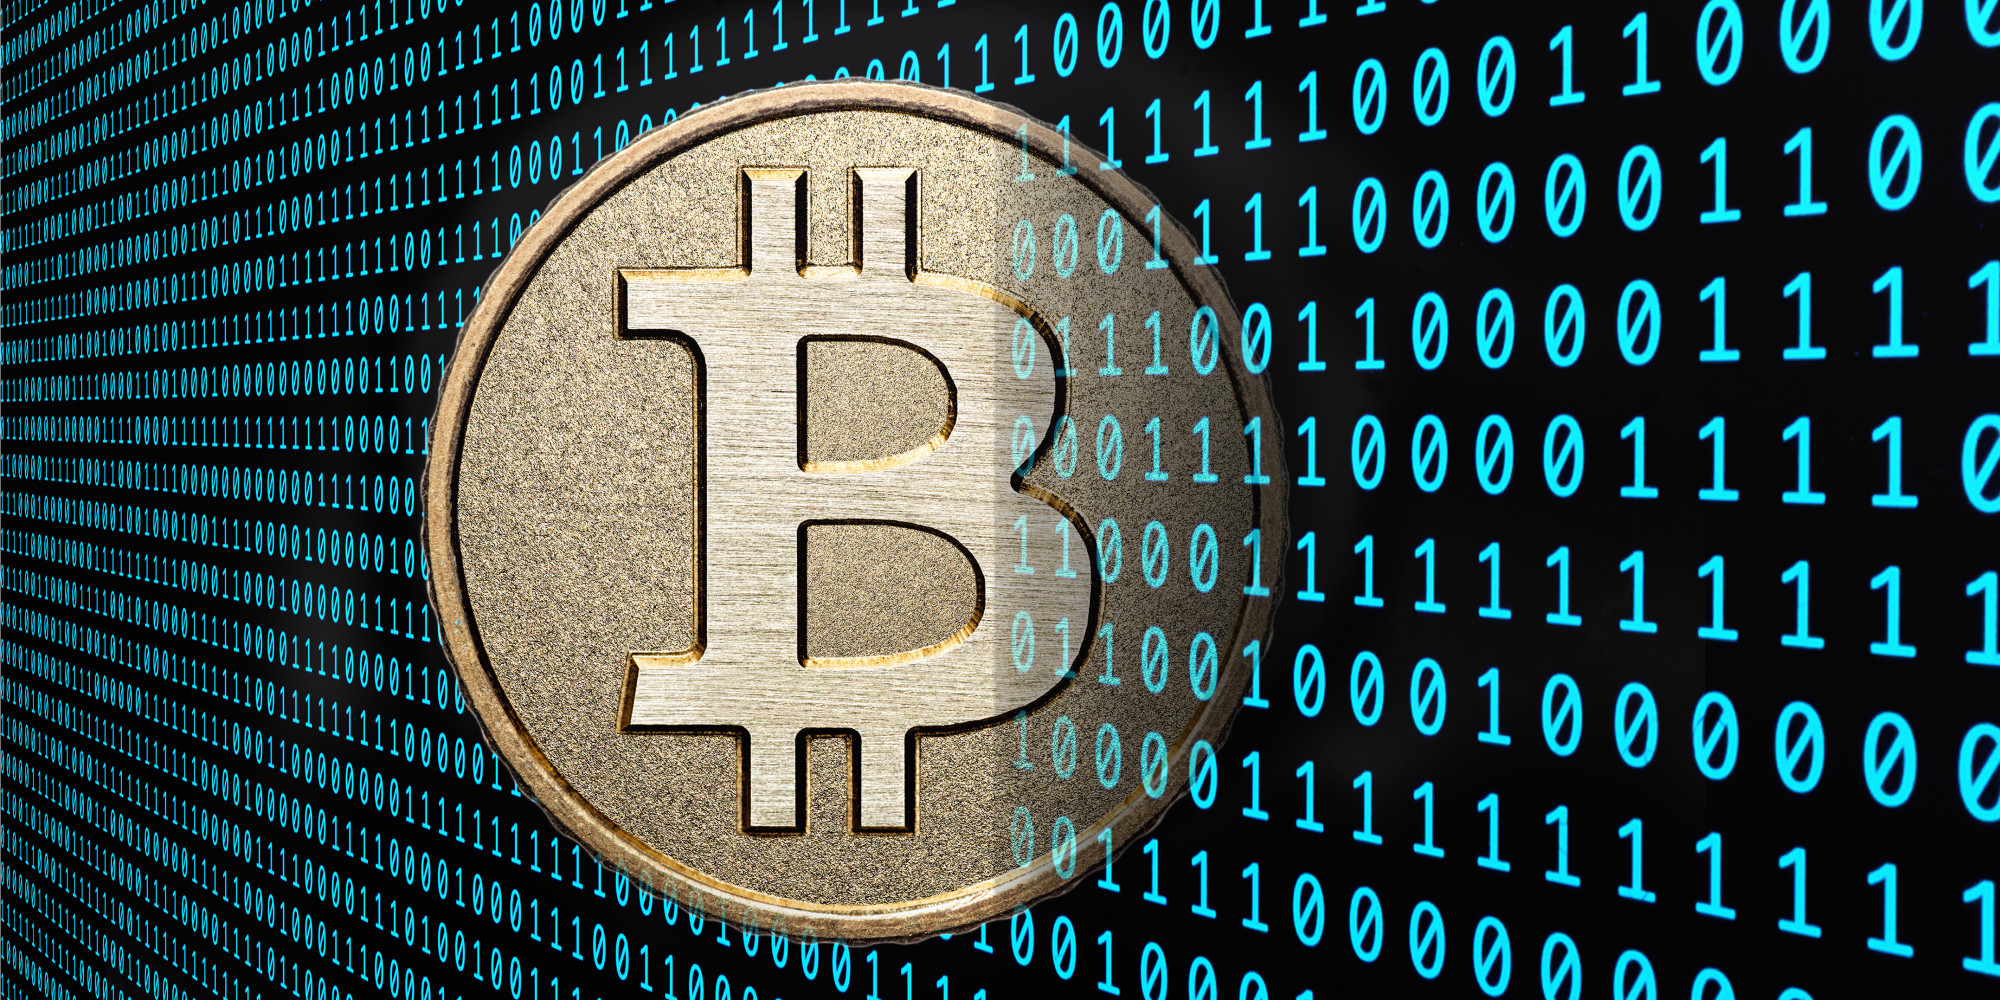 Bitcoin spalis, Bitcoin kasyklos